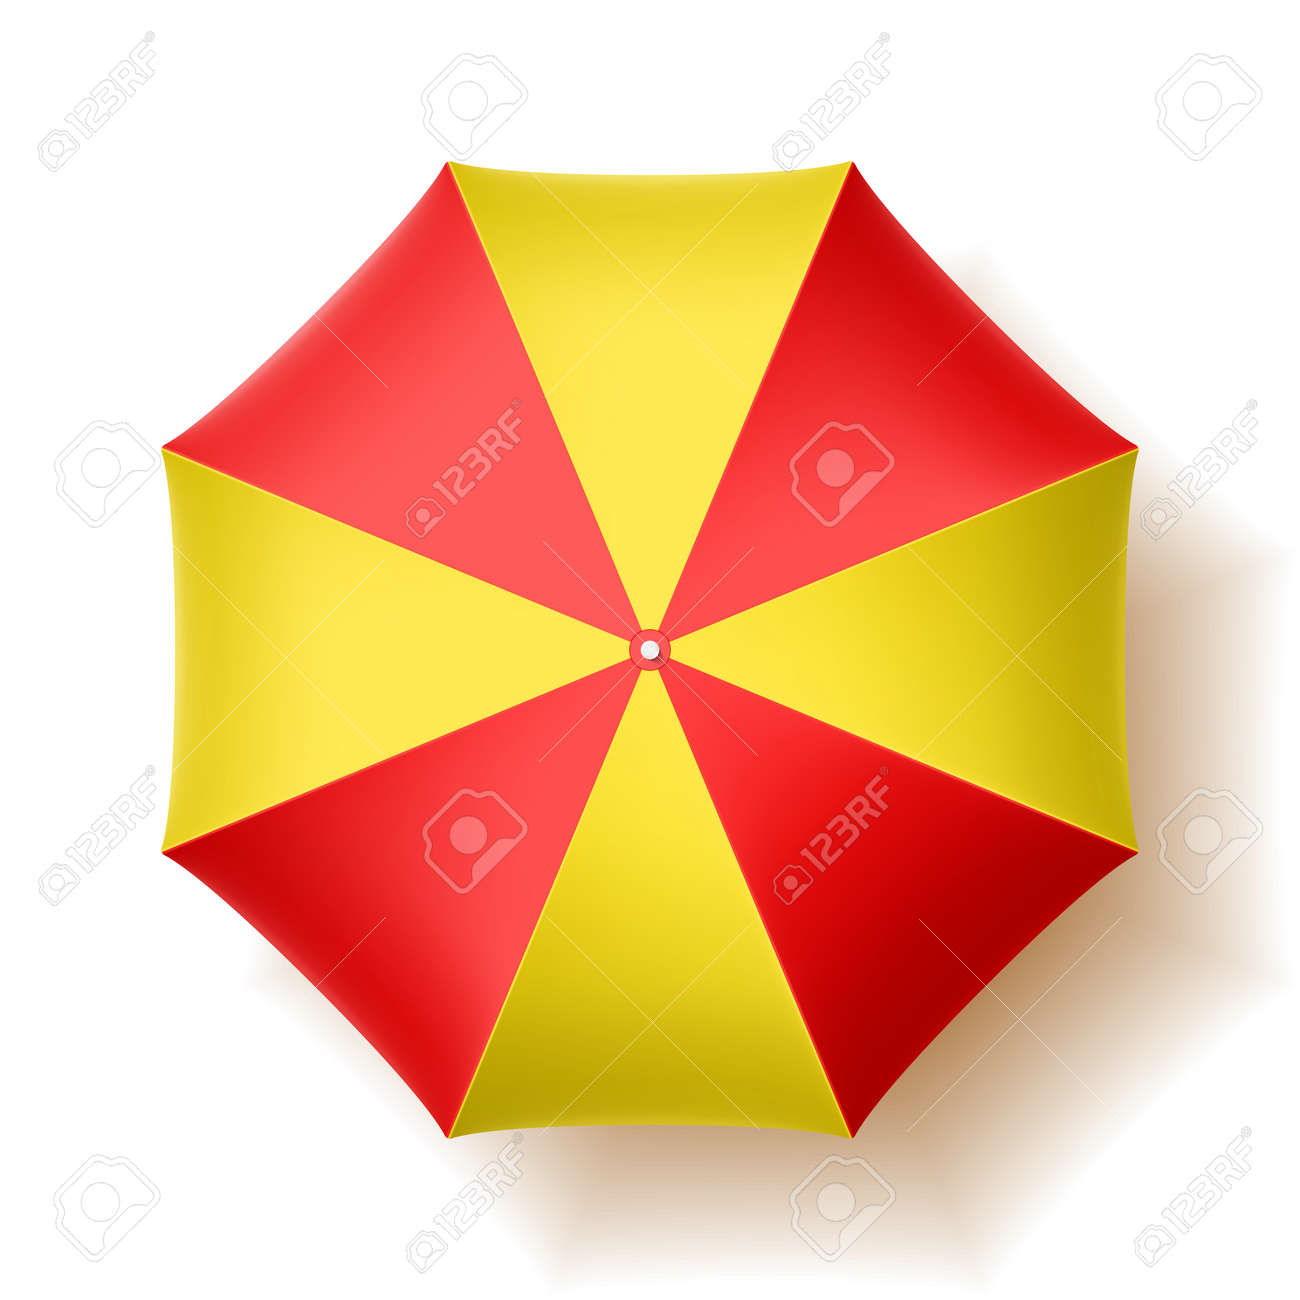 beach umbrella, top view royalty free cliparts, vectors, and stock